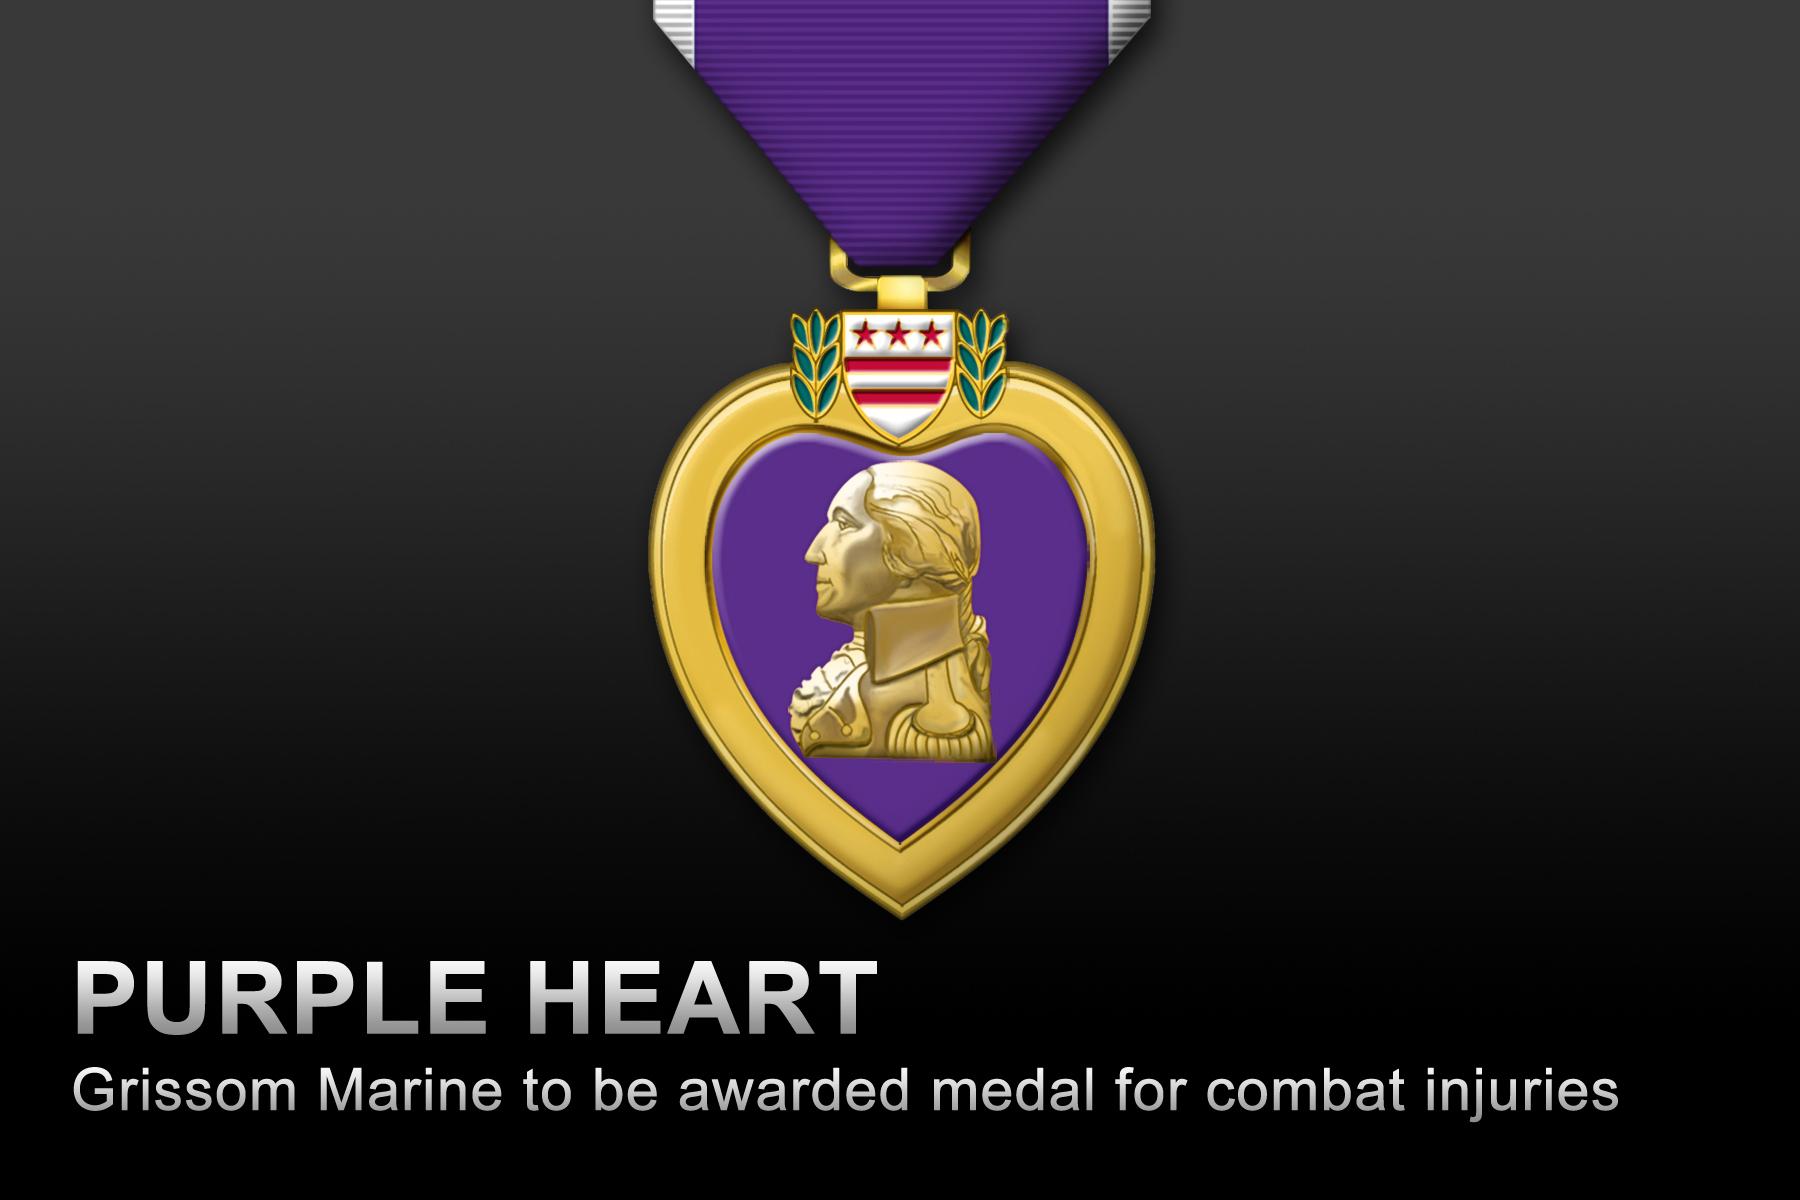 Grissom marine to be awarded purple heart grissom air reserve grissom marine to be awarded purple heart buycottarizona